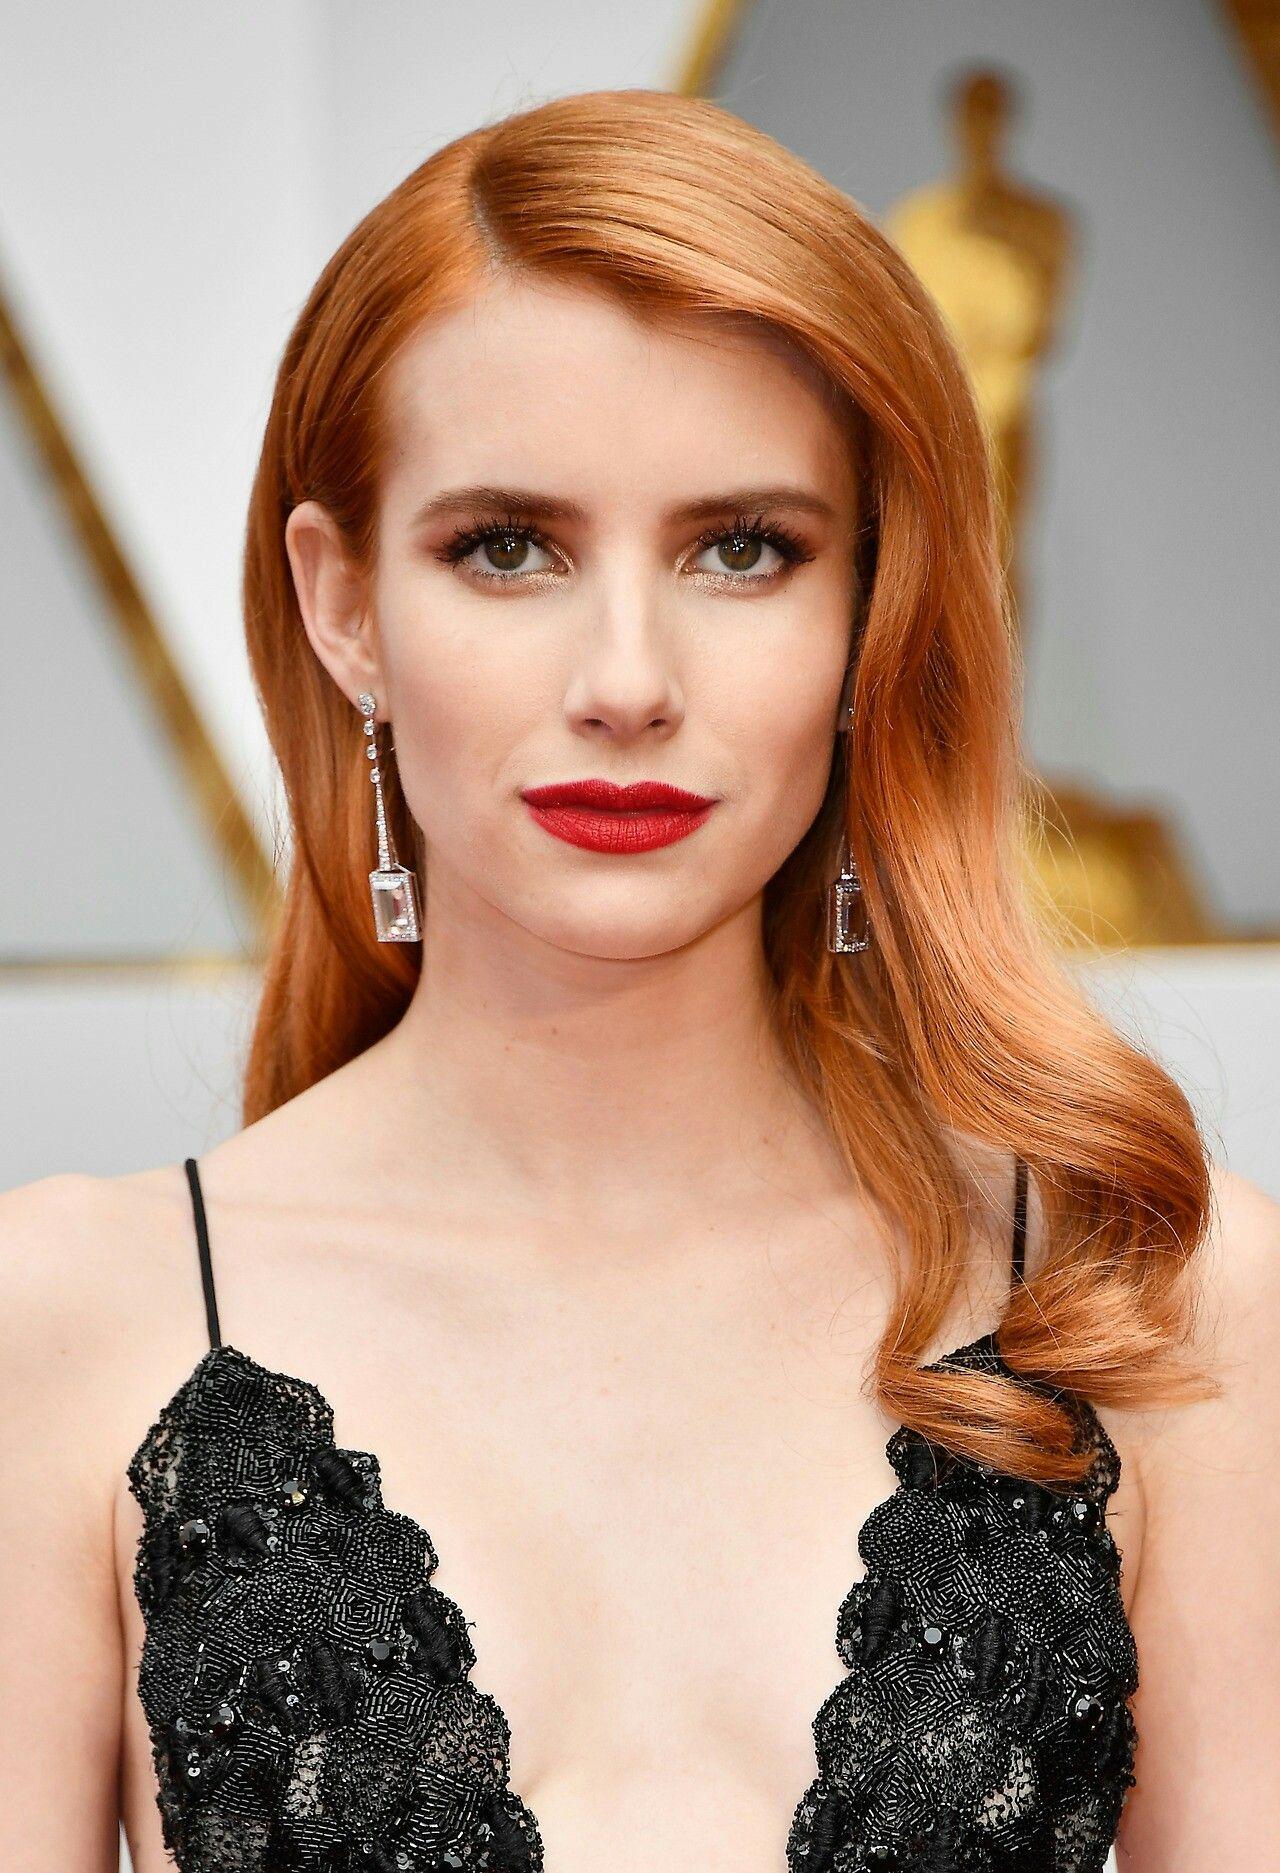 Emma Roberts Rocks Old Hollywood Glam With A Modern Twist photo